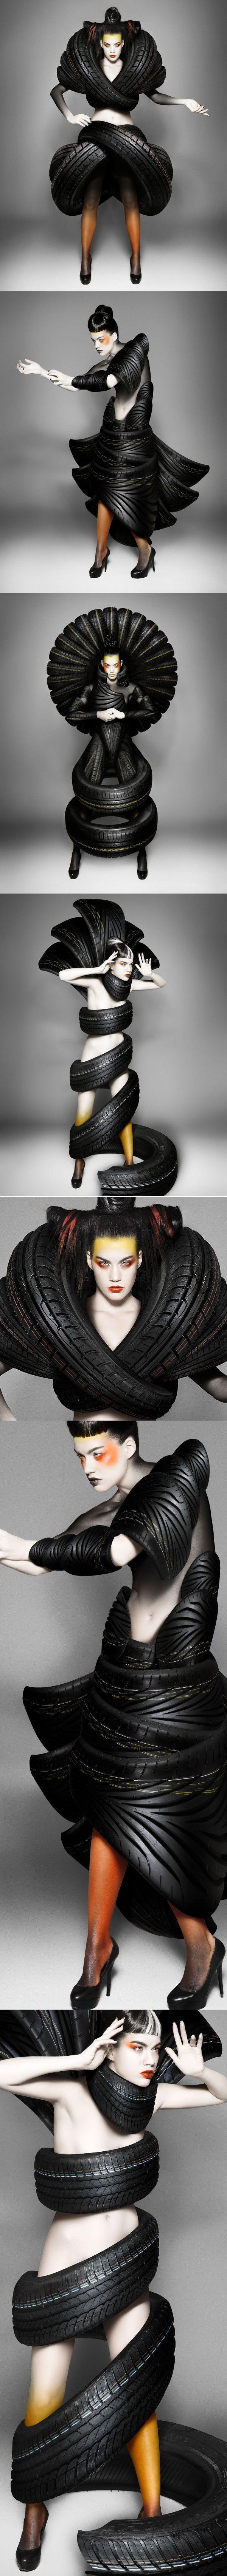 TREADWEAR COSTUME DESIGN & POSTPRODUCTION Carl Elkins @ Mierswa-Kluska PHOTOGRAPHY Mierswa-Kluska HAIR & MAKE-UP Susan Voss-Redfern María José Castañer